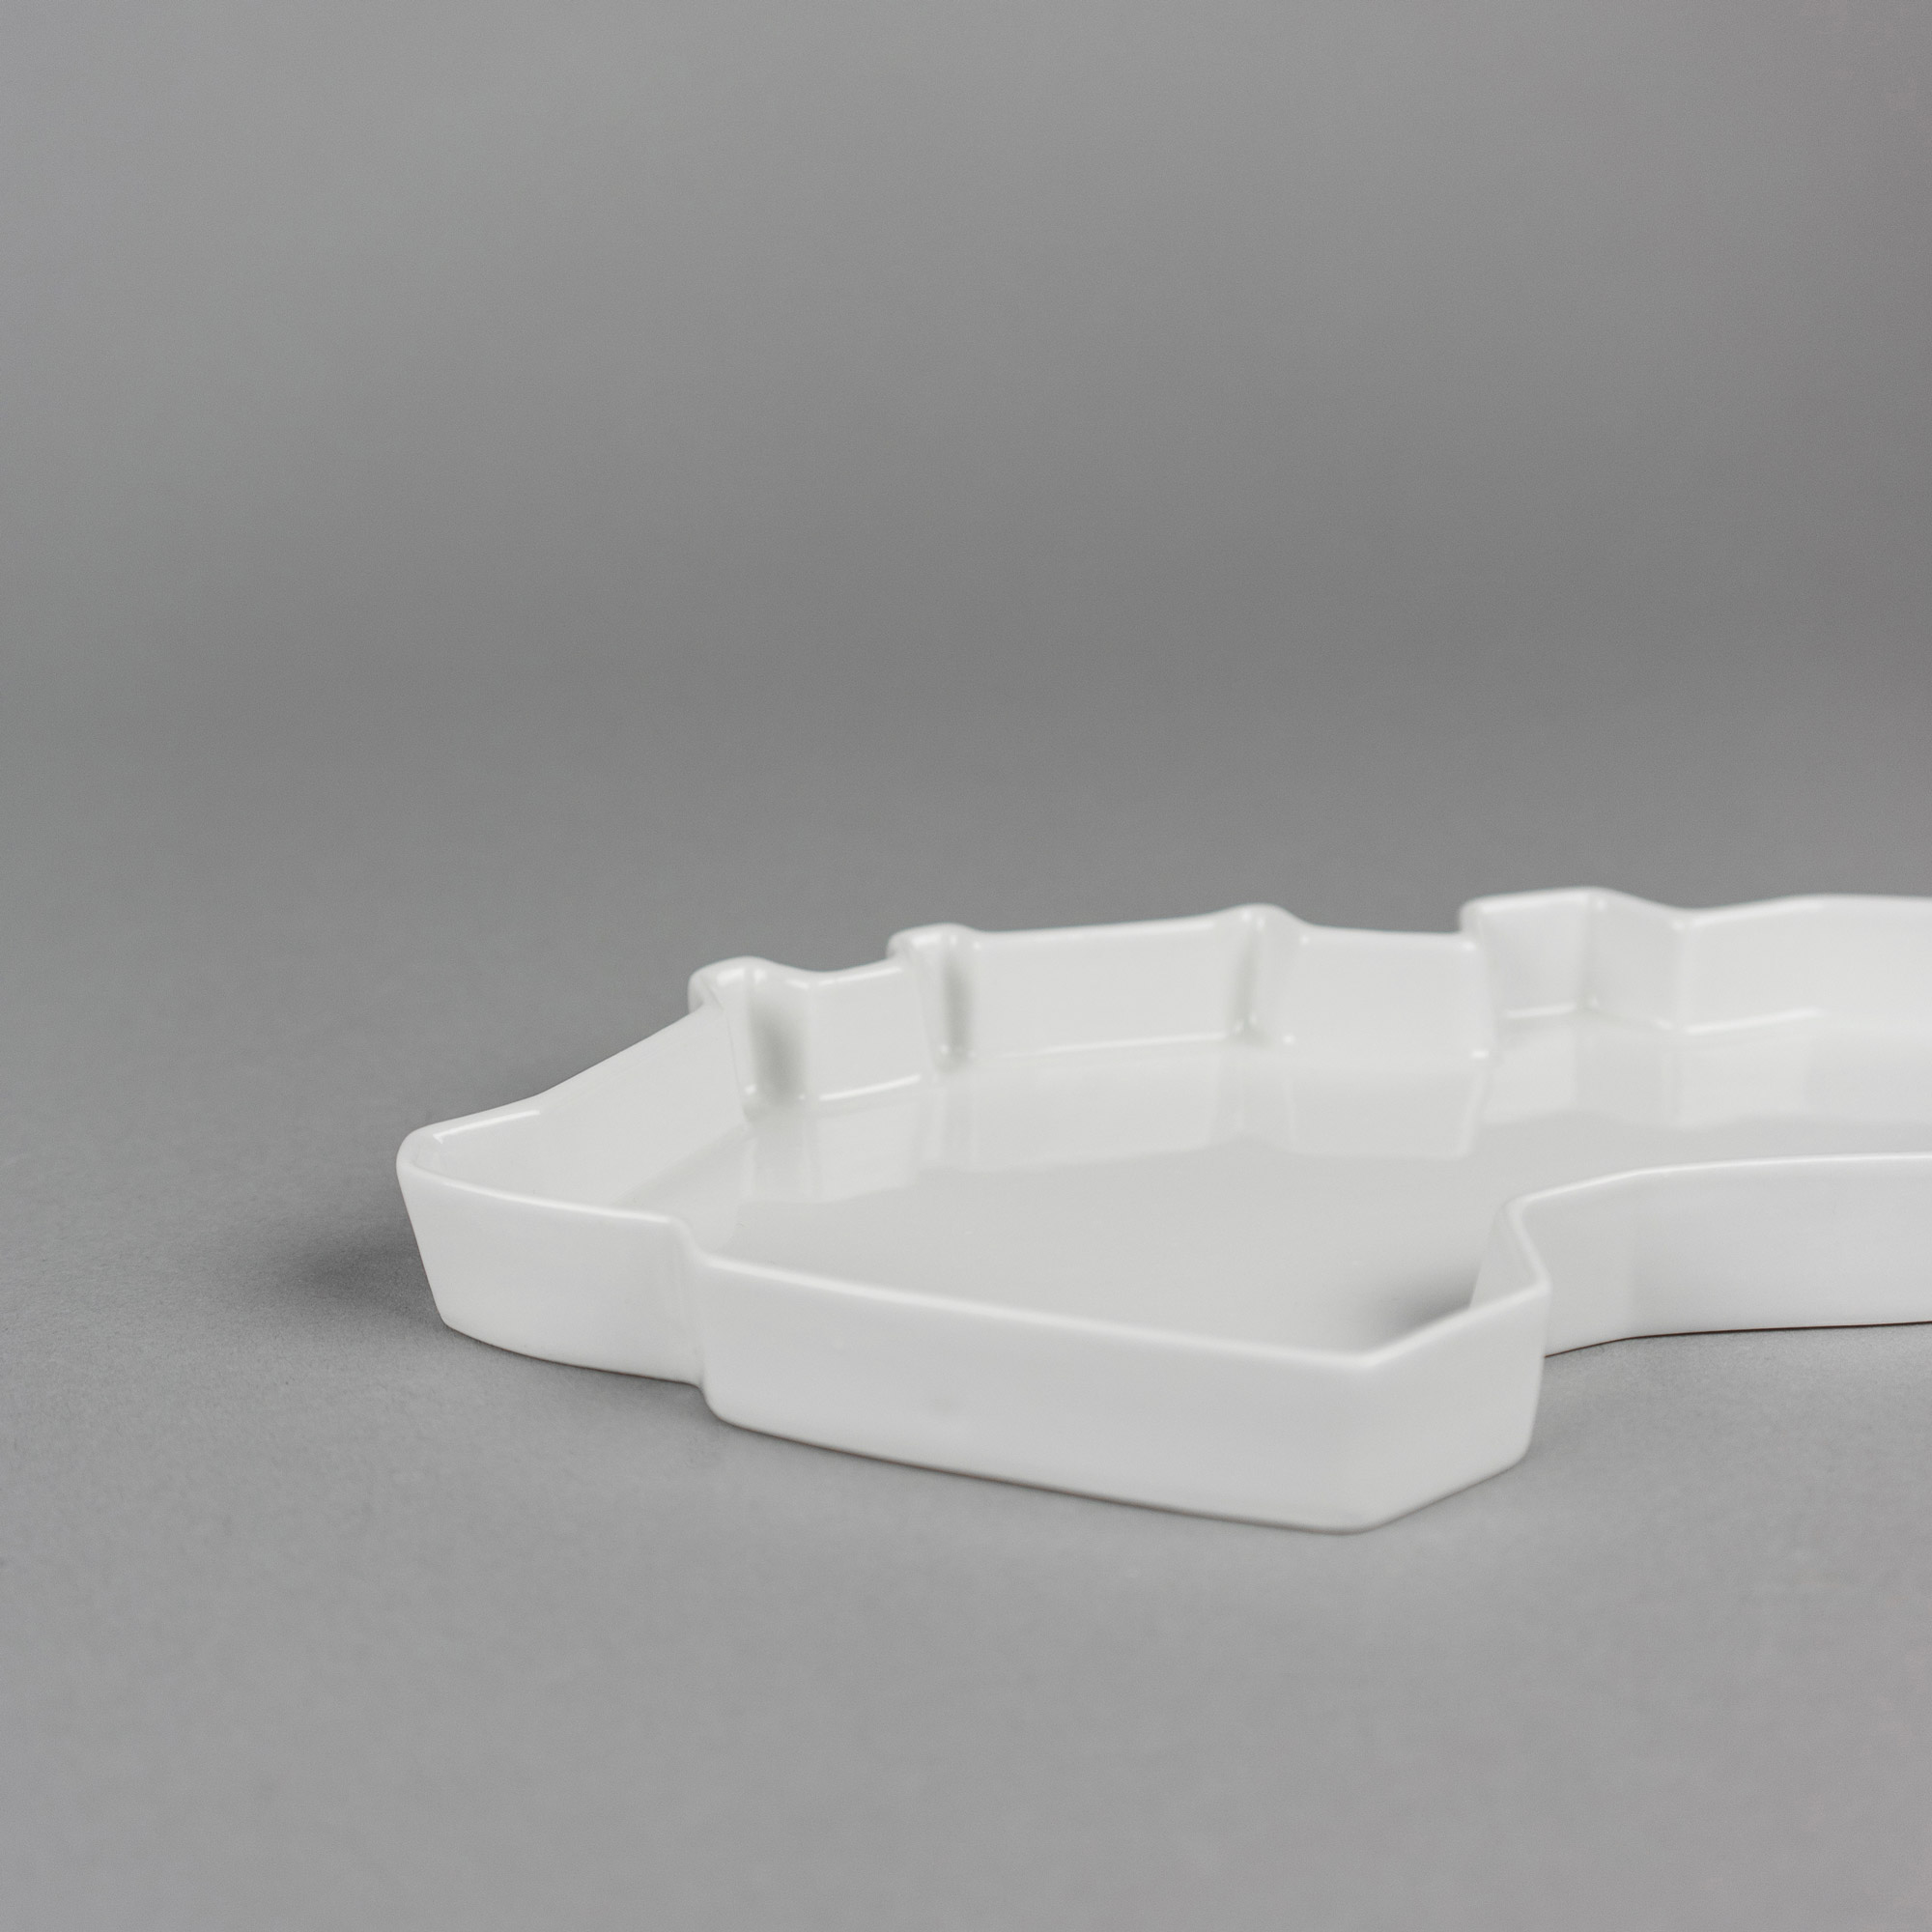 White porcelain tray by Qubus design studio